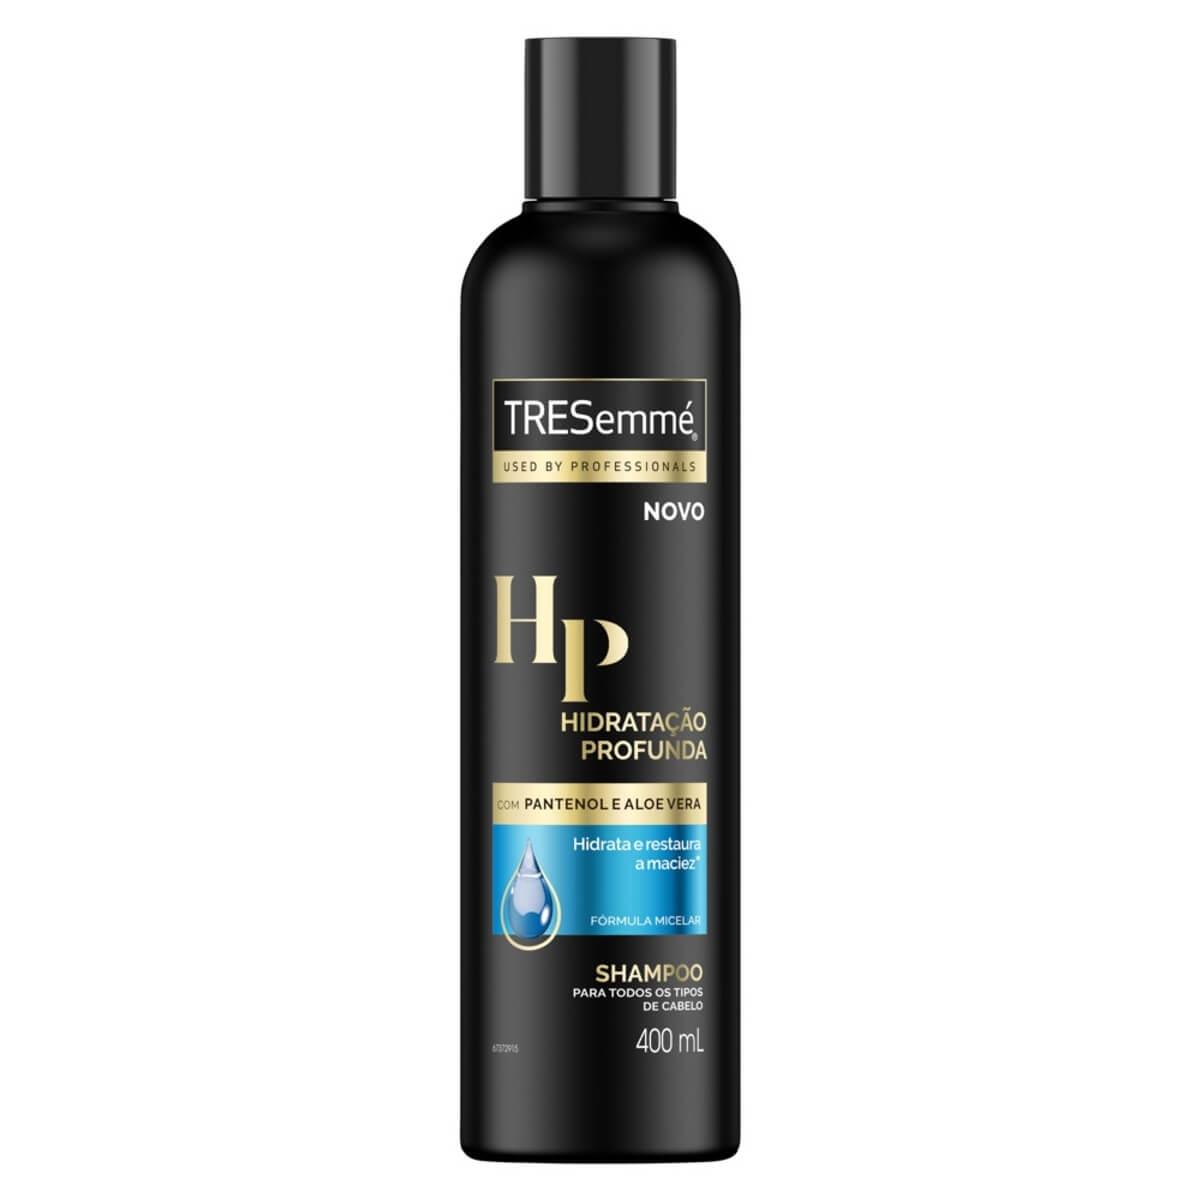 Shampoo TRESemmé Hidratação Profunda com 400ml 400ml